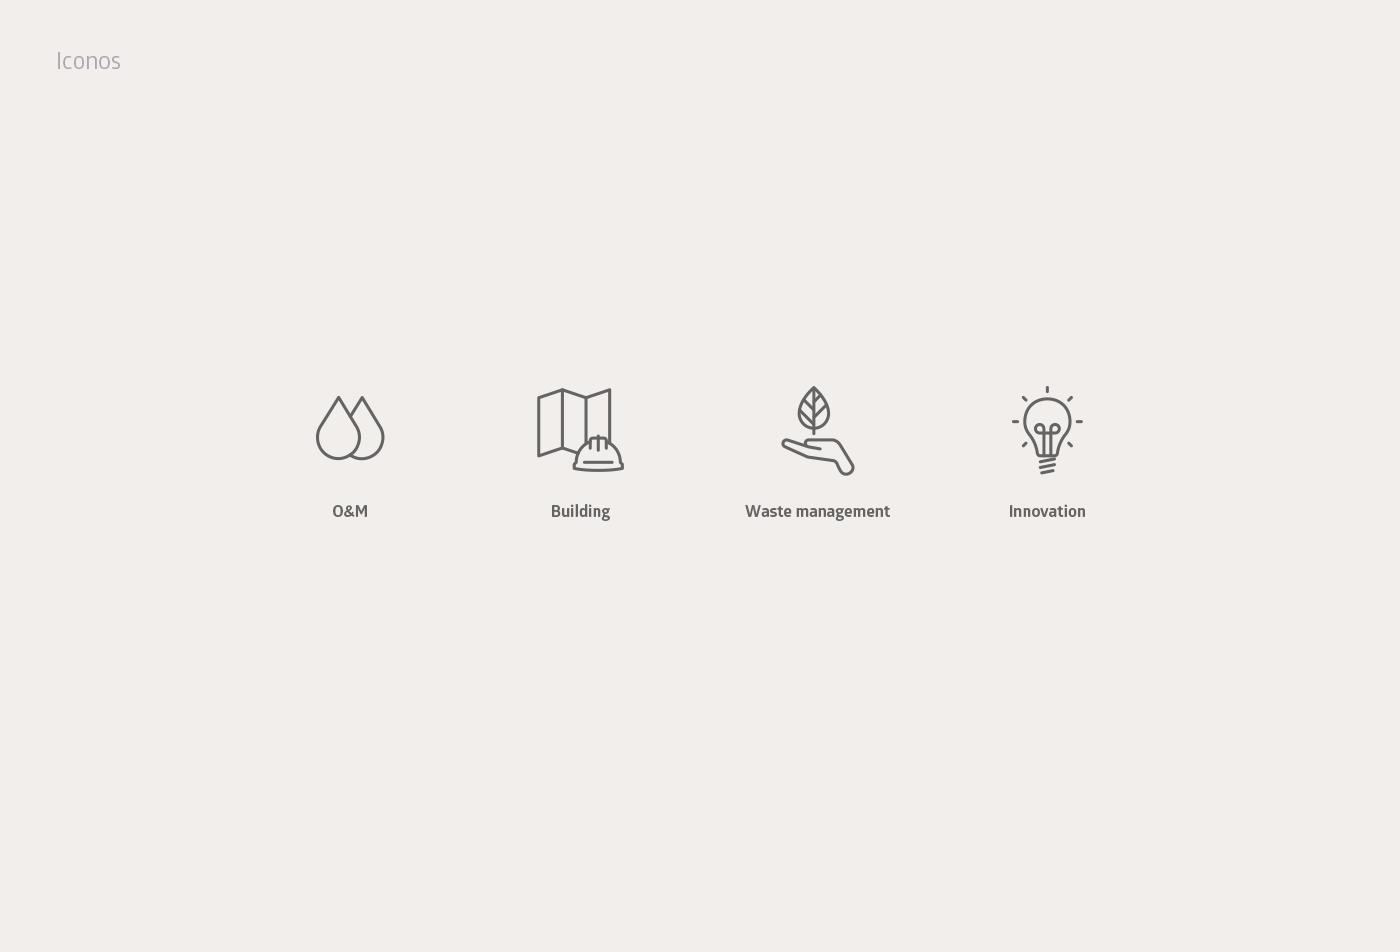 pixelarte-diseno-grafico-iconos-pictogramas-Dam_Depuracion_Aguas_Mediterraneo